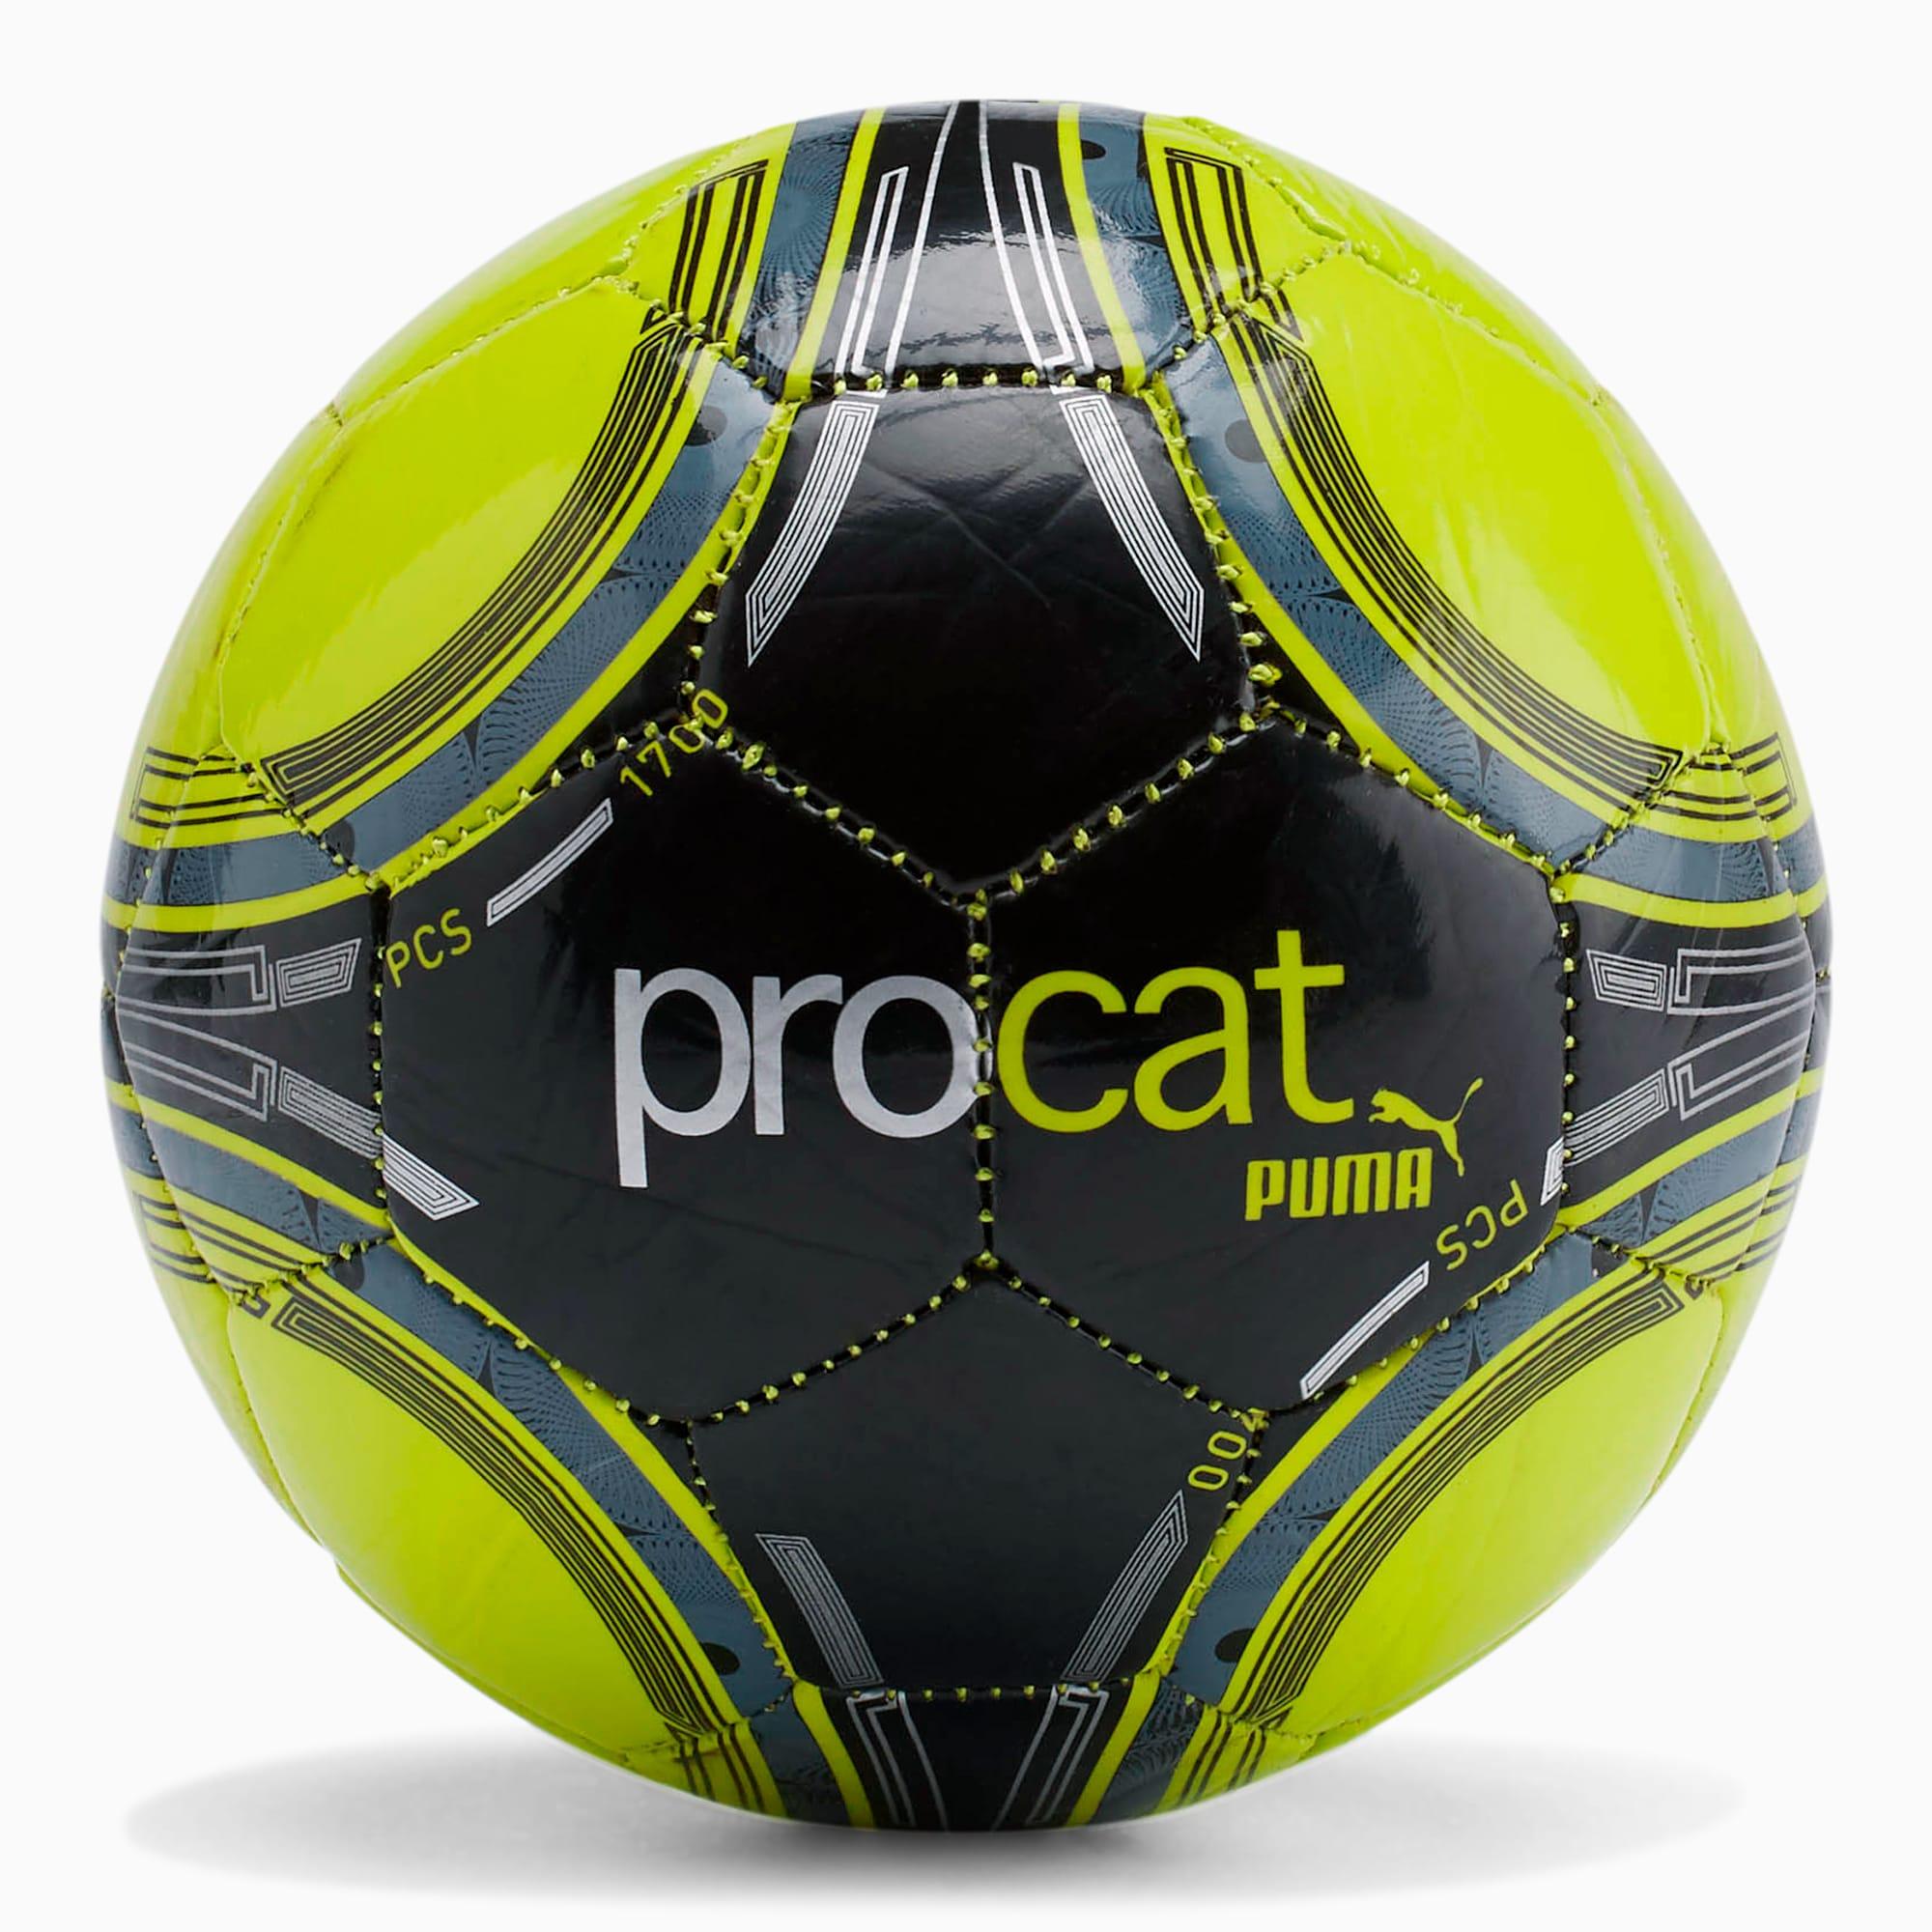 puma procat soccer ball